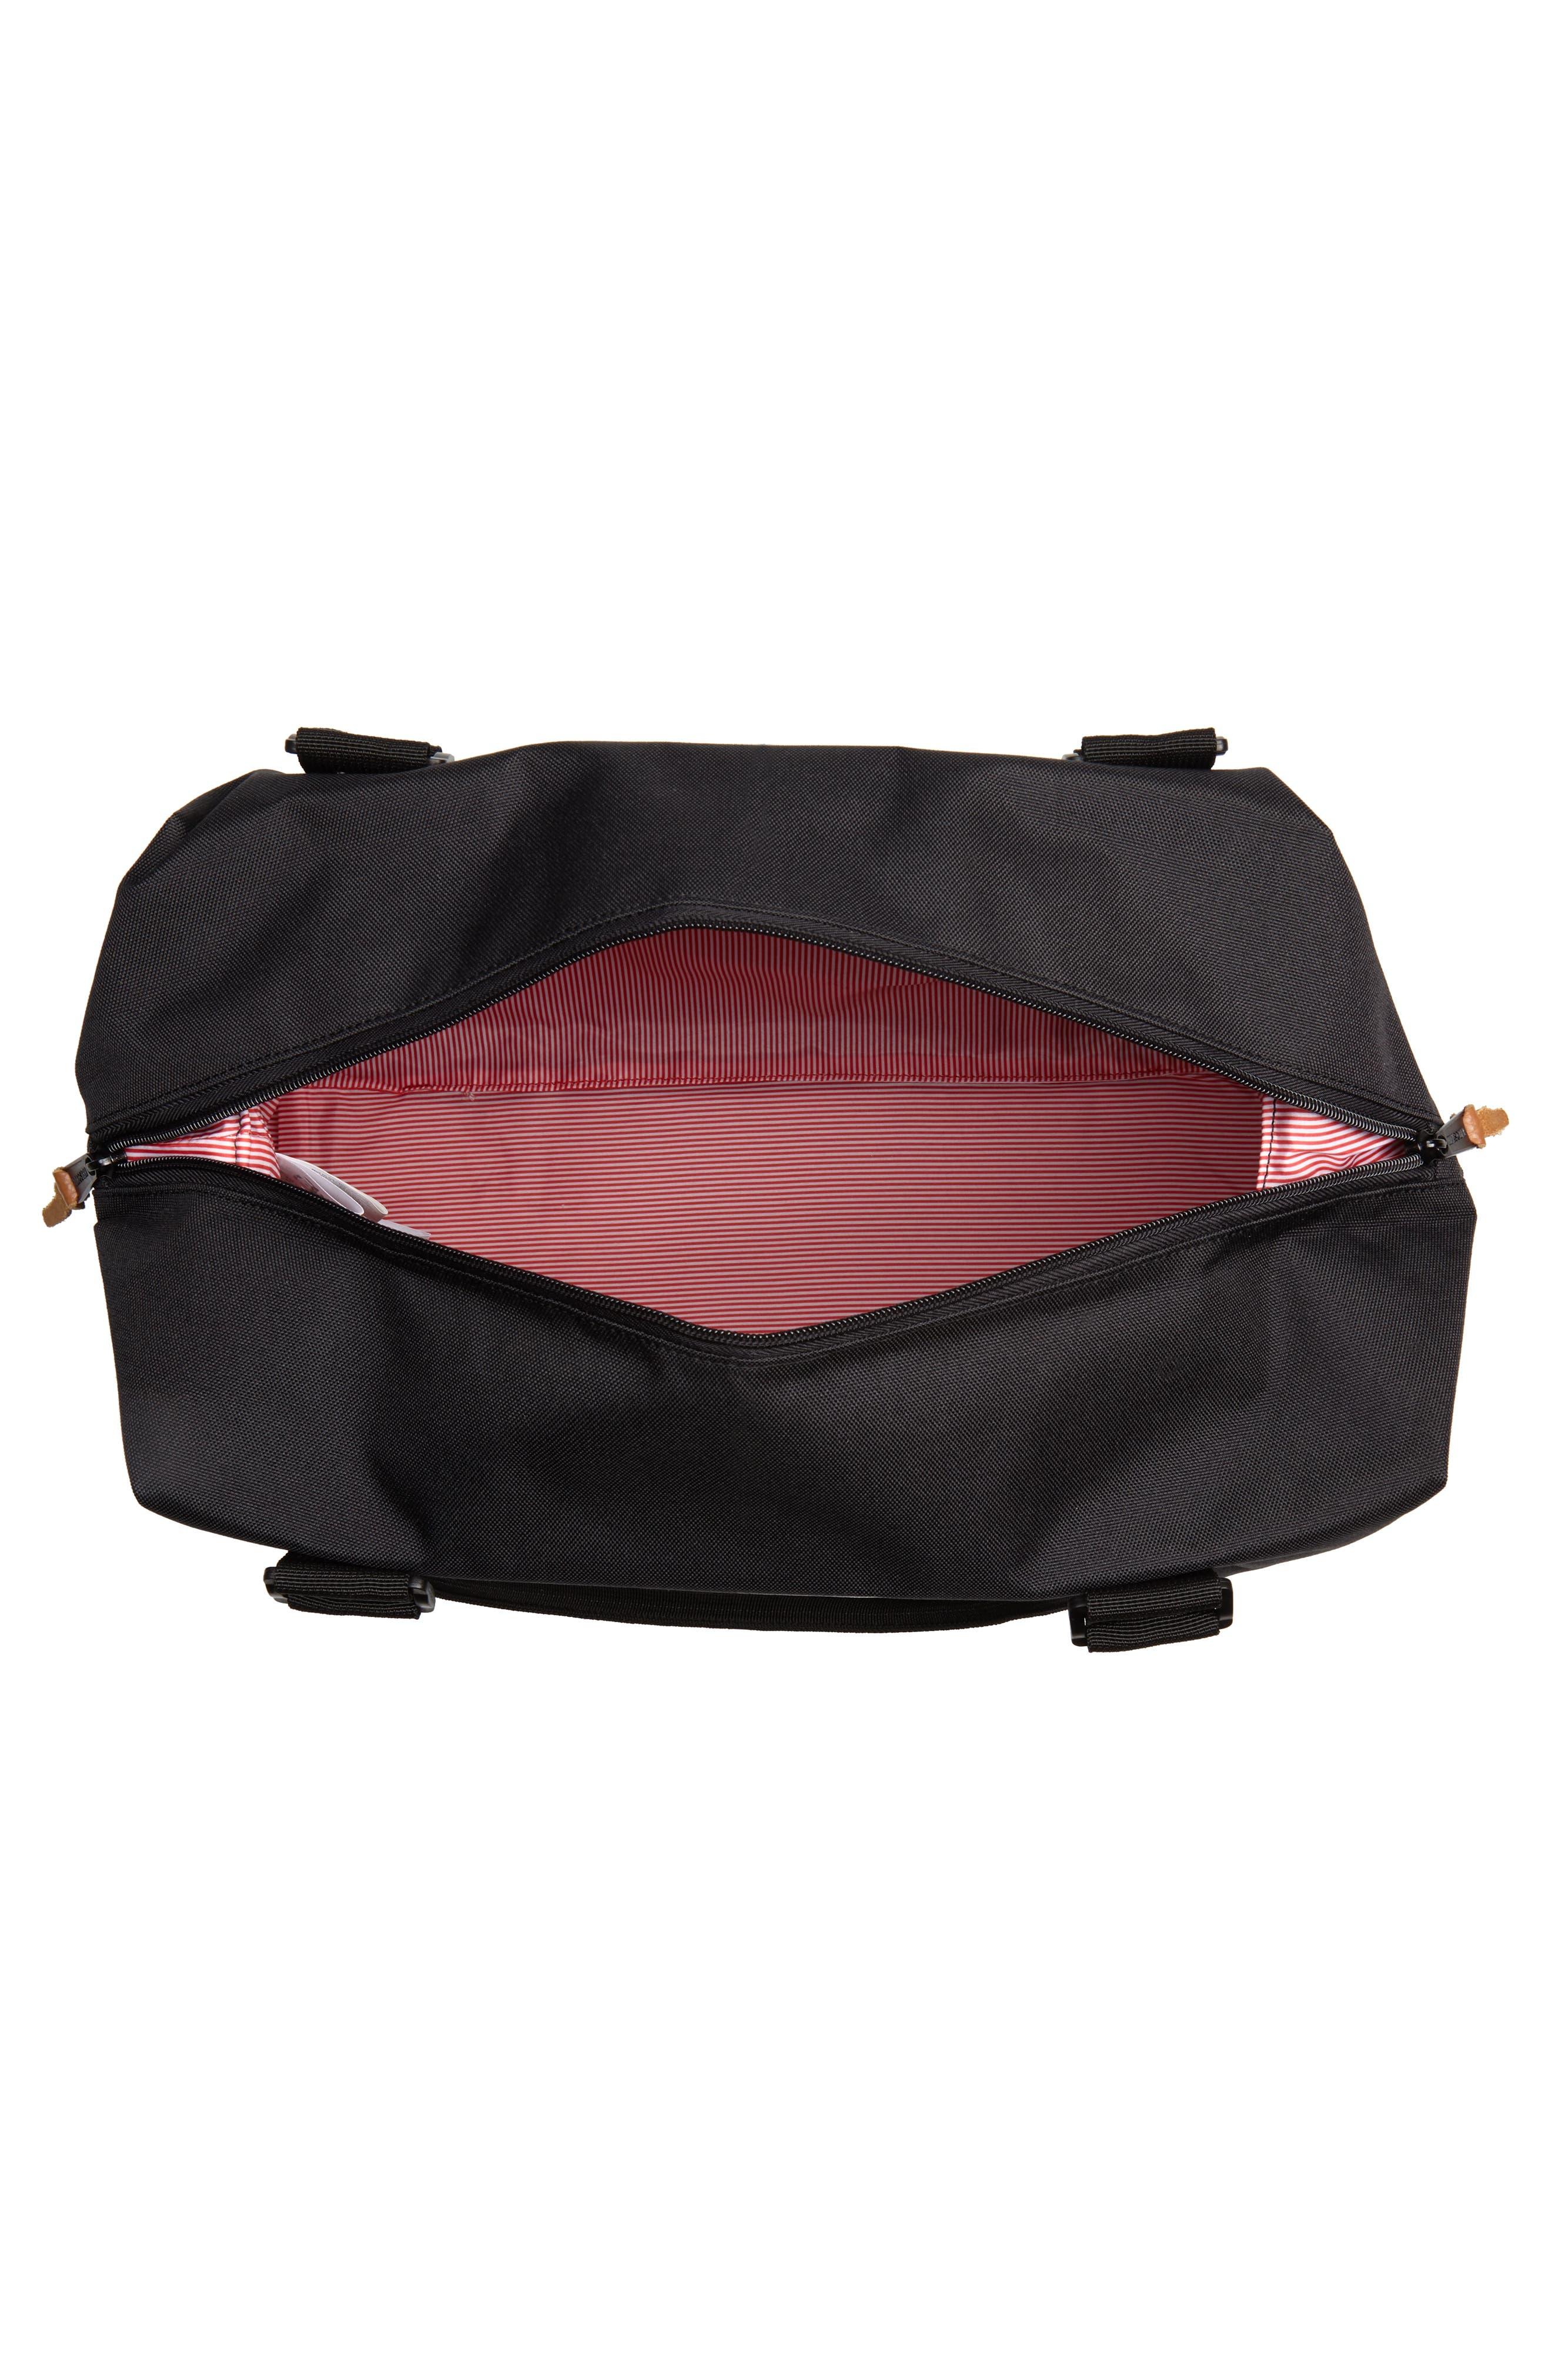 Strand Duffel Bag,                             Alternate thumbnail 4, color,                             Black